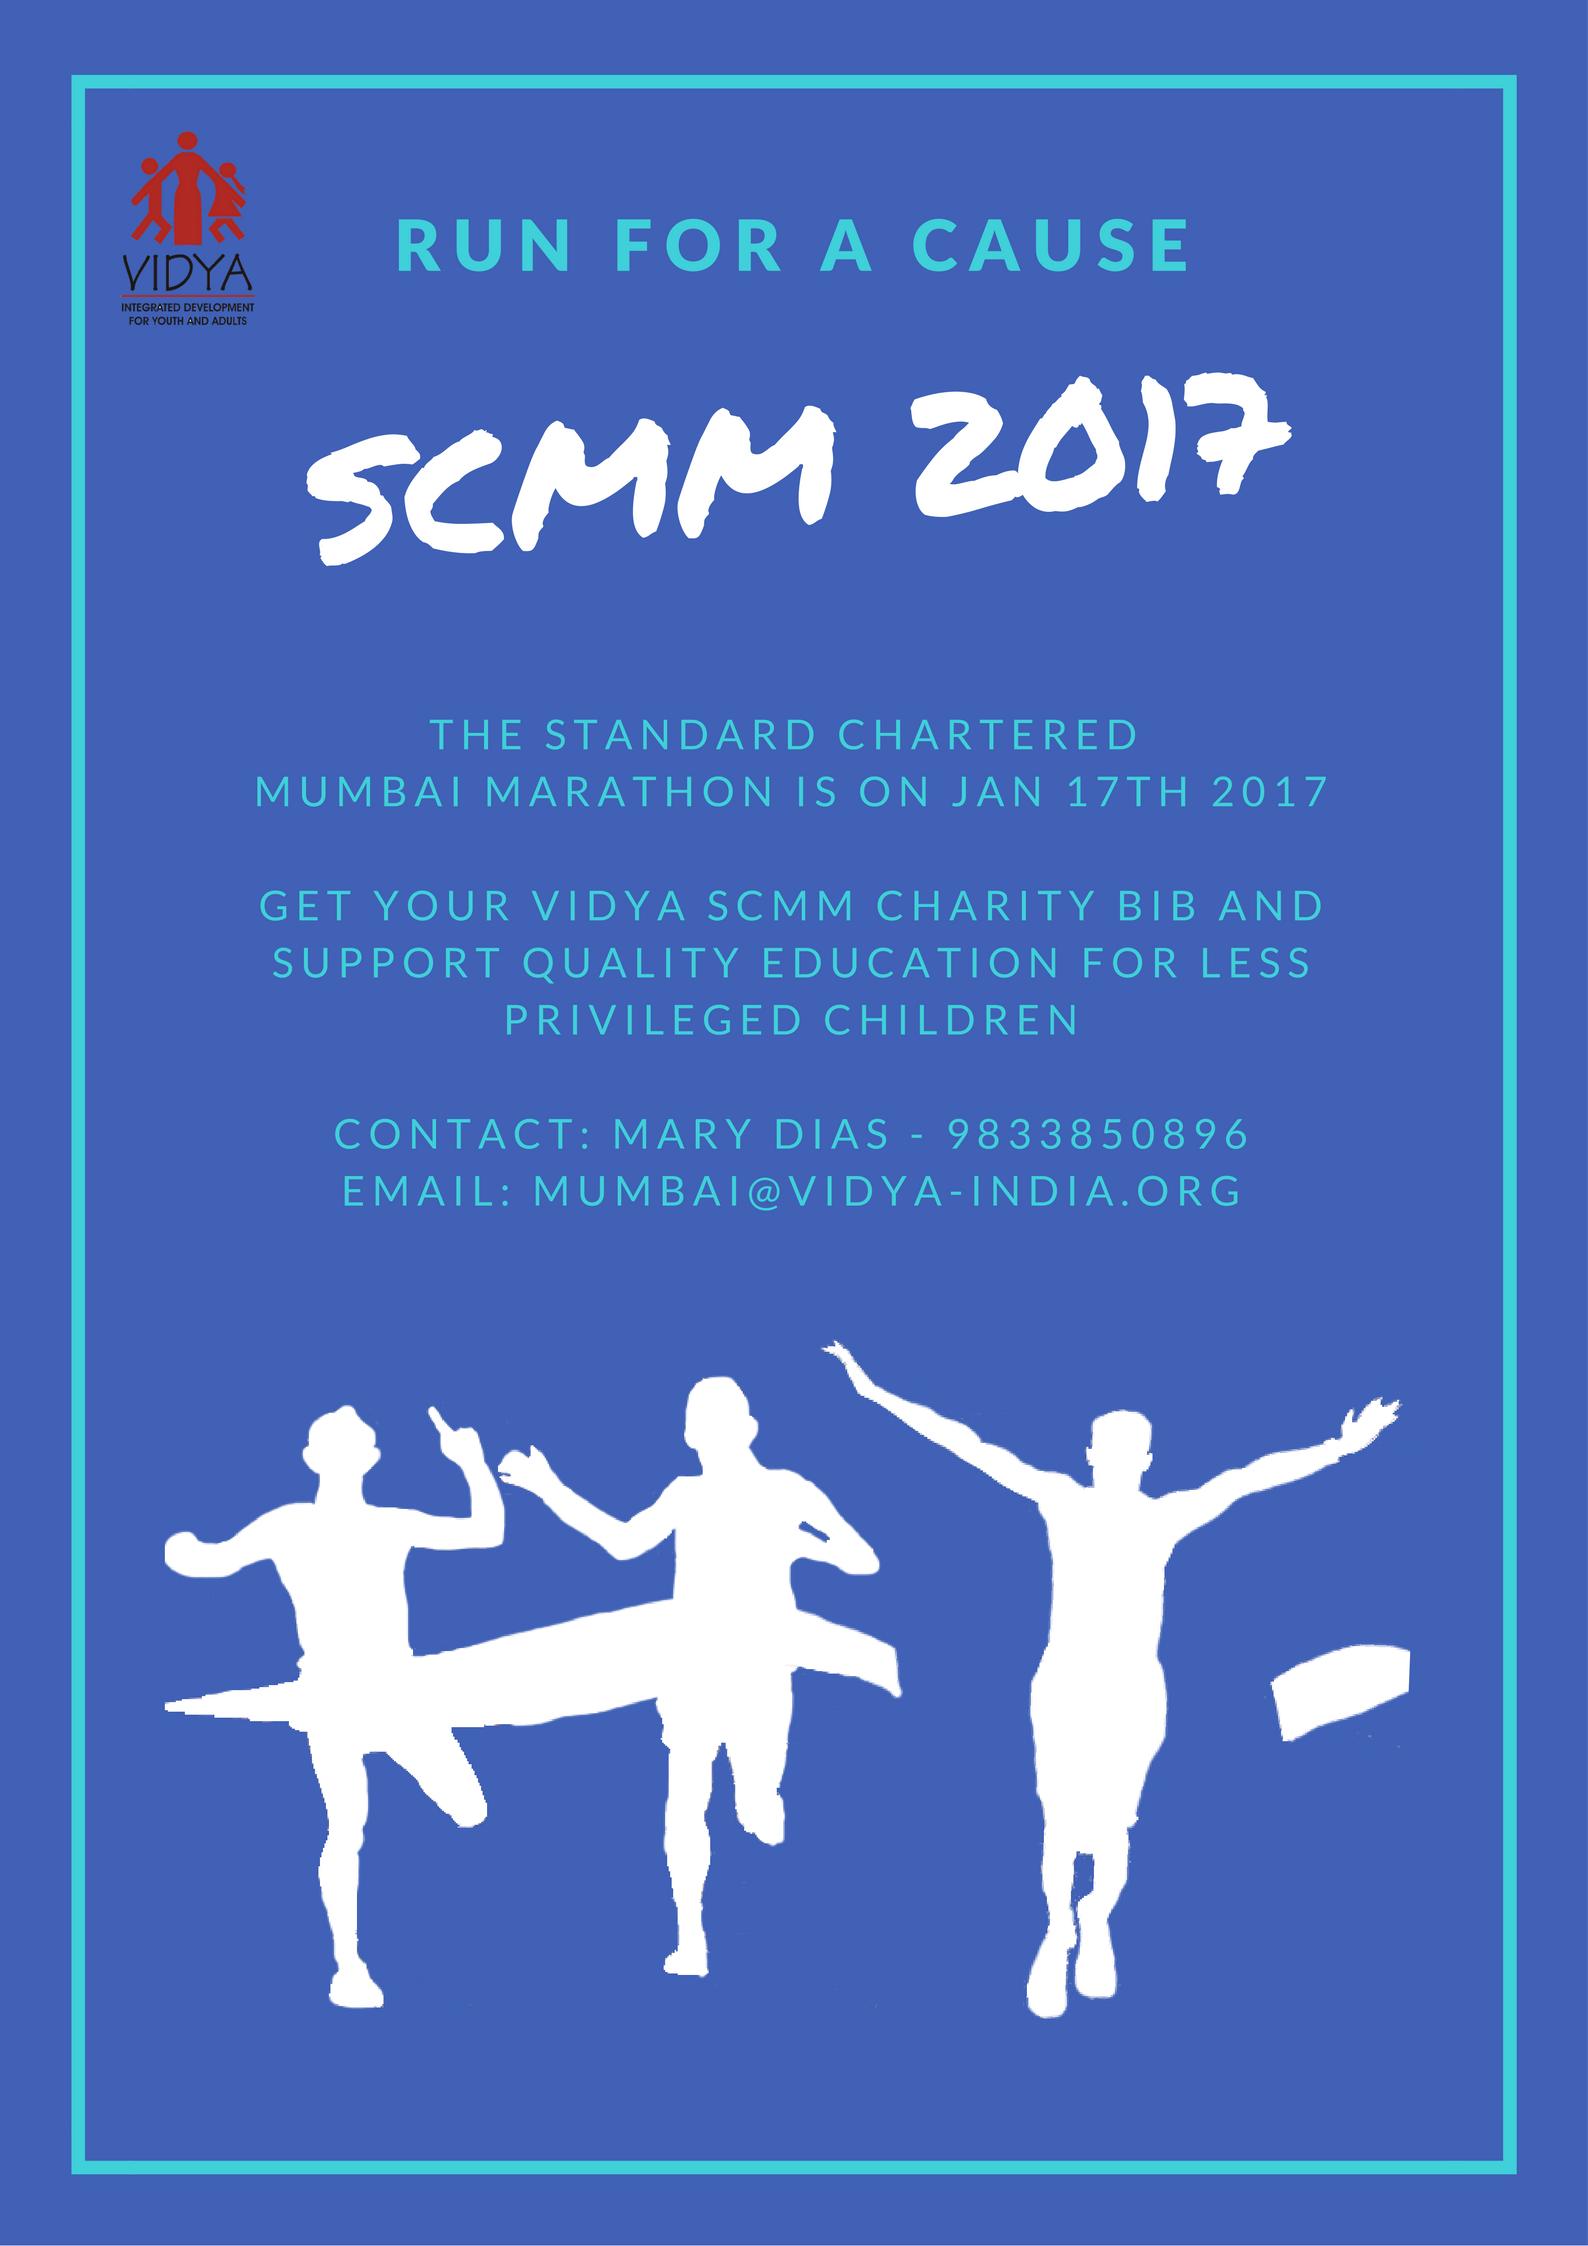 vidya_india_ngo_scmm2017